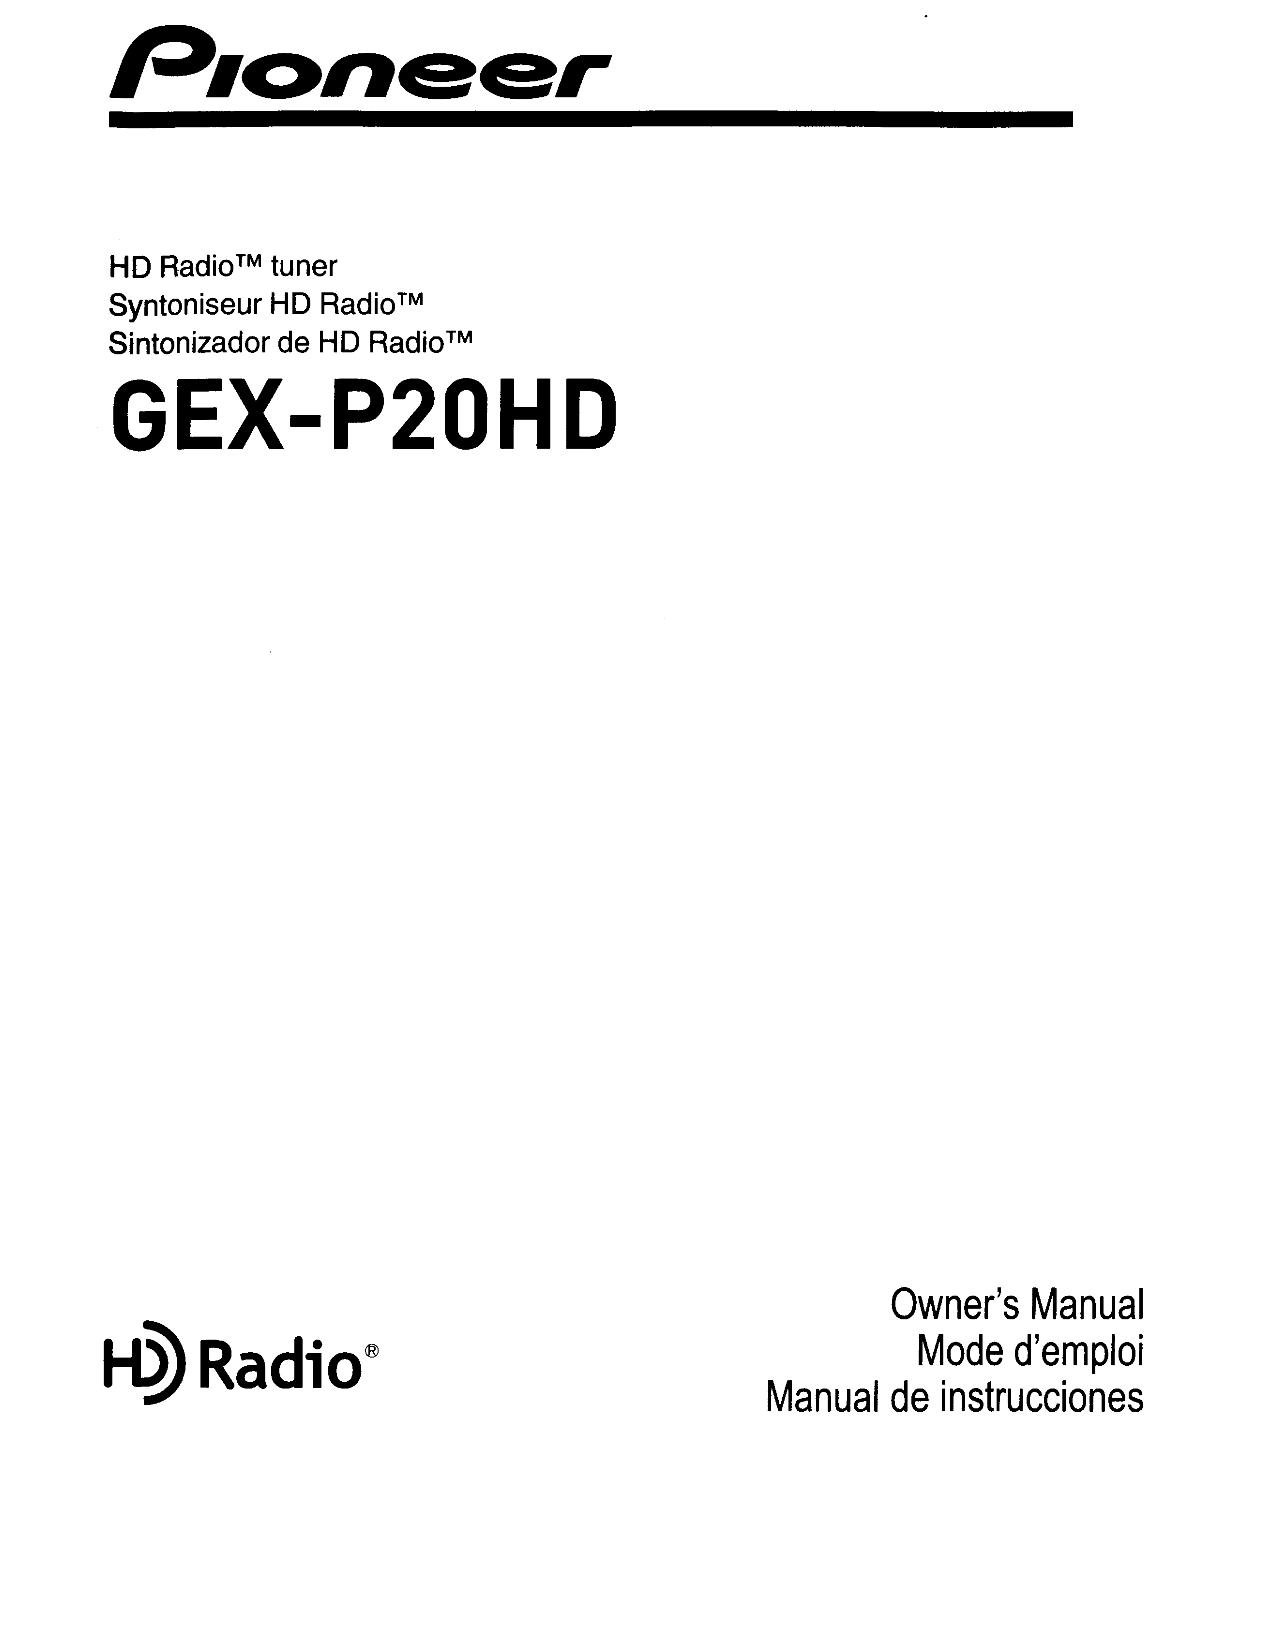 download free pdf for pioneer deh p400ub car receiver manual pioneer premier deh-p400ub wiring diagram pioneer deh-p400ub manual